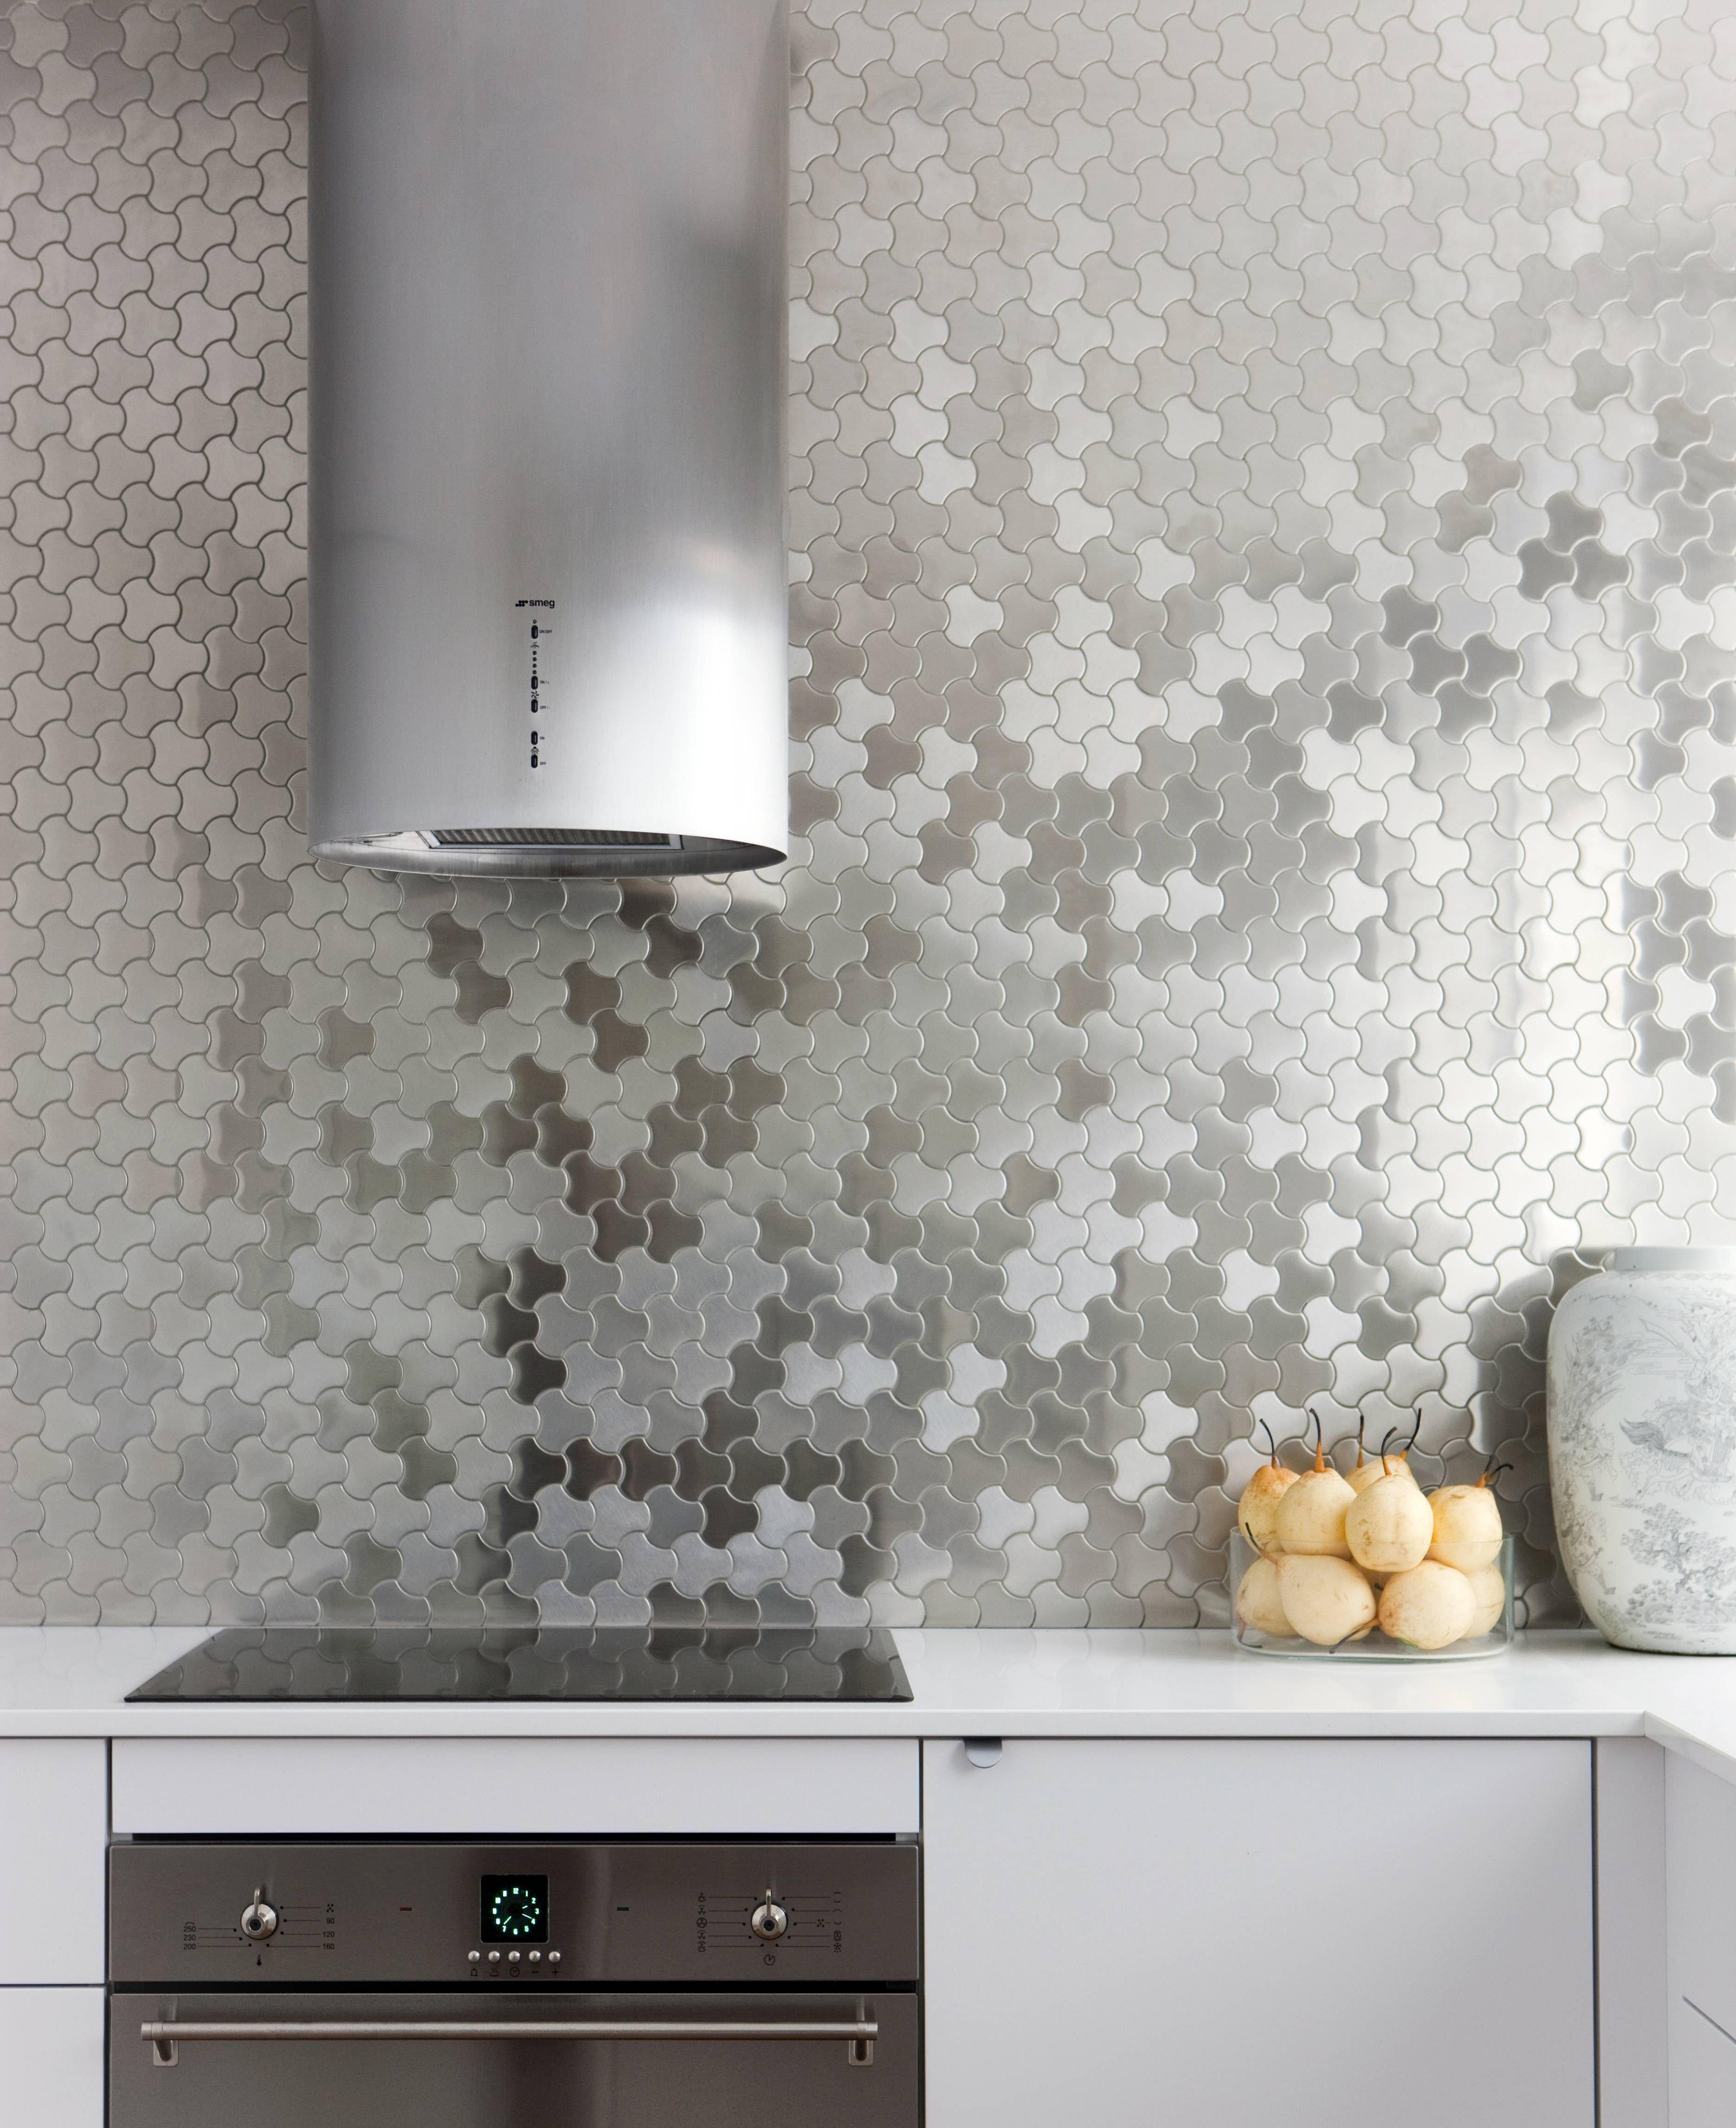 Karim For Alloy Ubiquity Mosaic Tile In Brushed Stainless Steel Kitchen Splashback Interior By Brendan Wong Design Photo Maree Homer